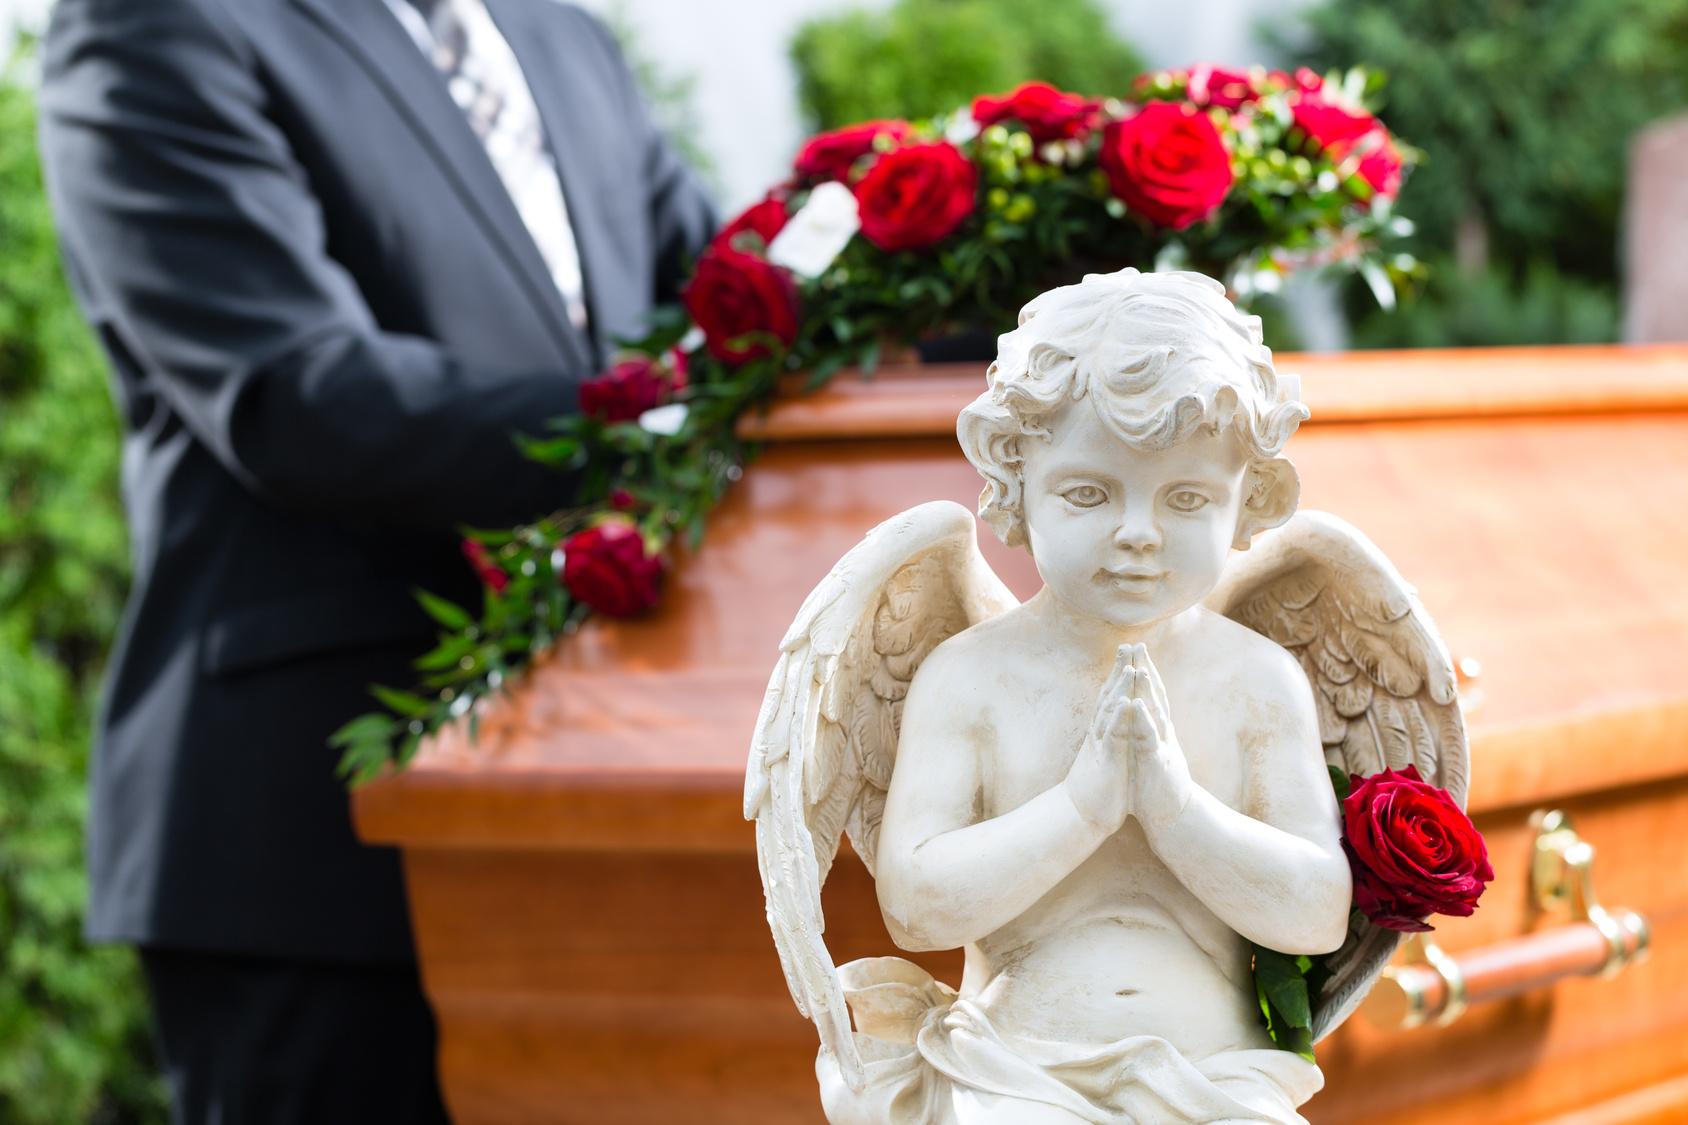 Agenzia funebre Onoranze Funebri Molendi OIinto